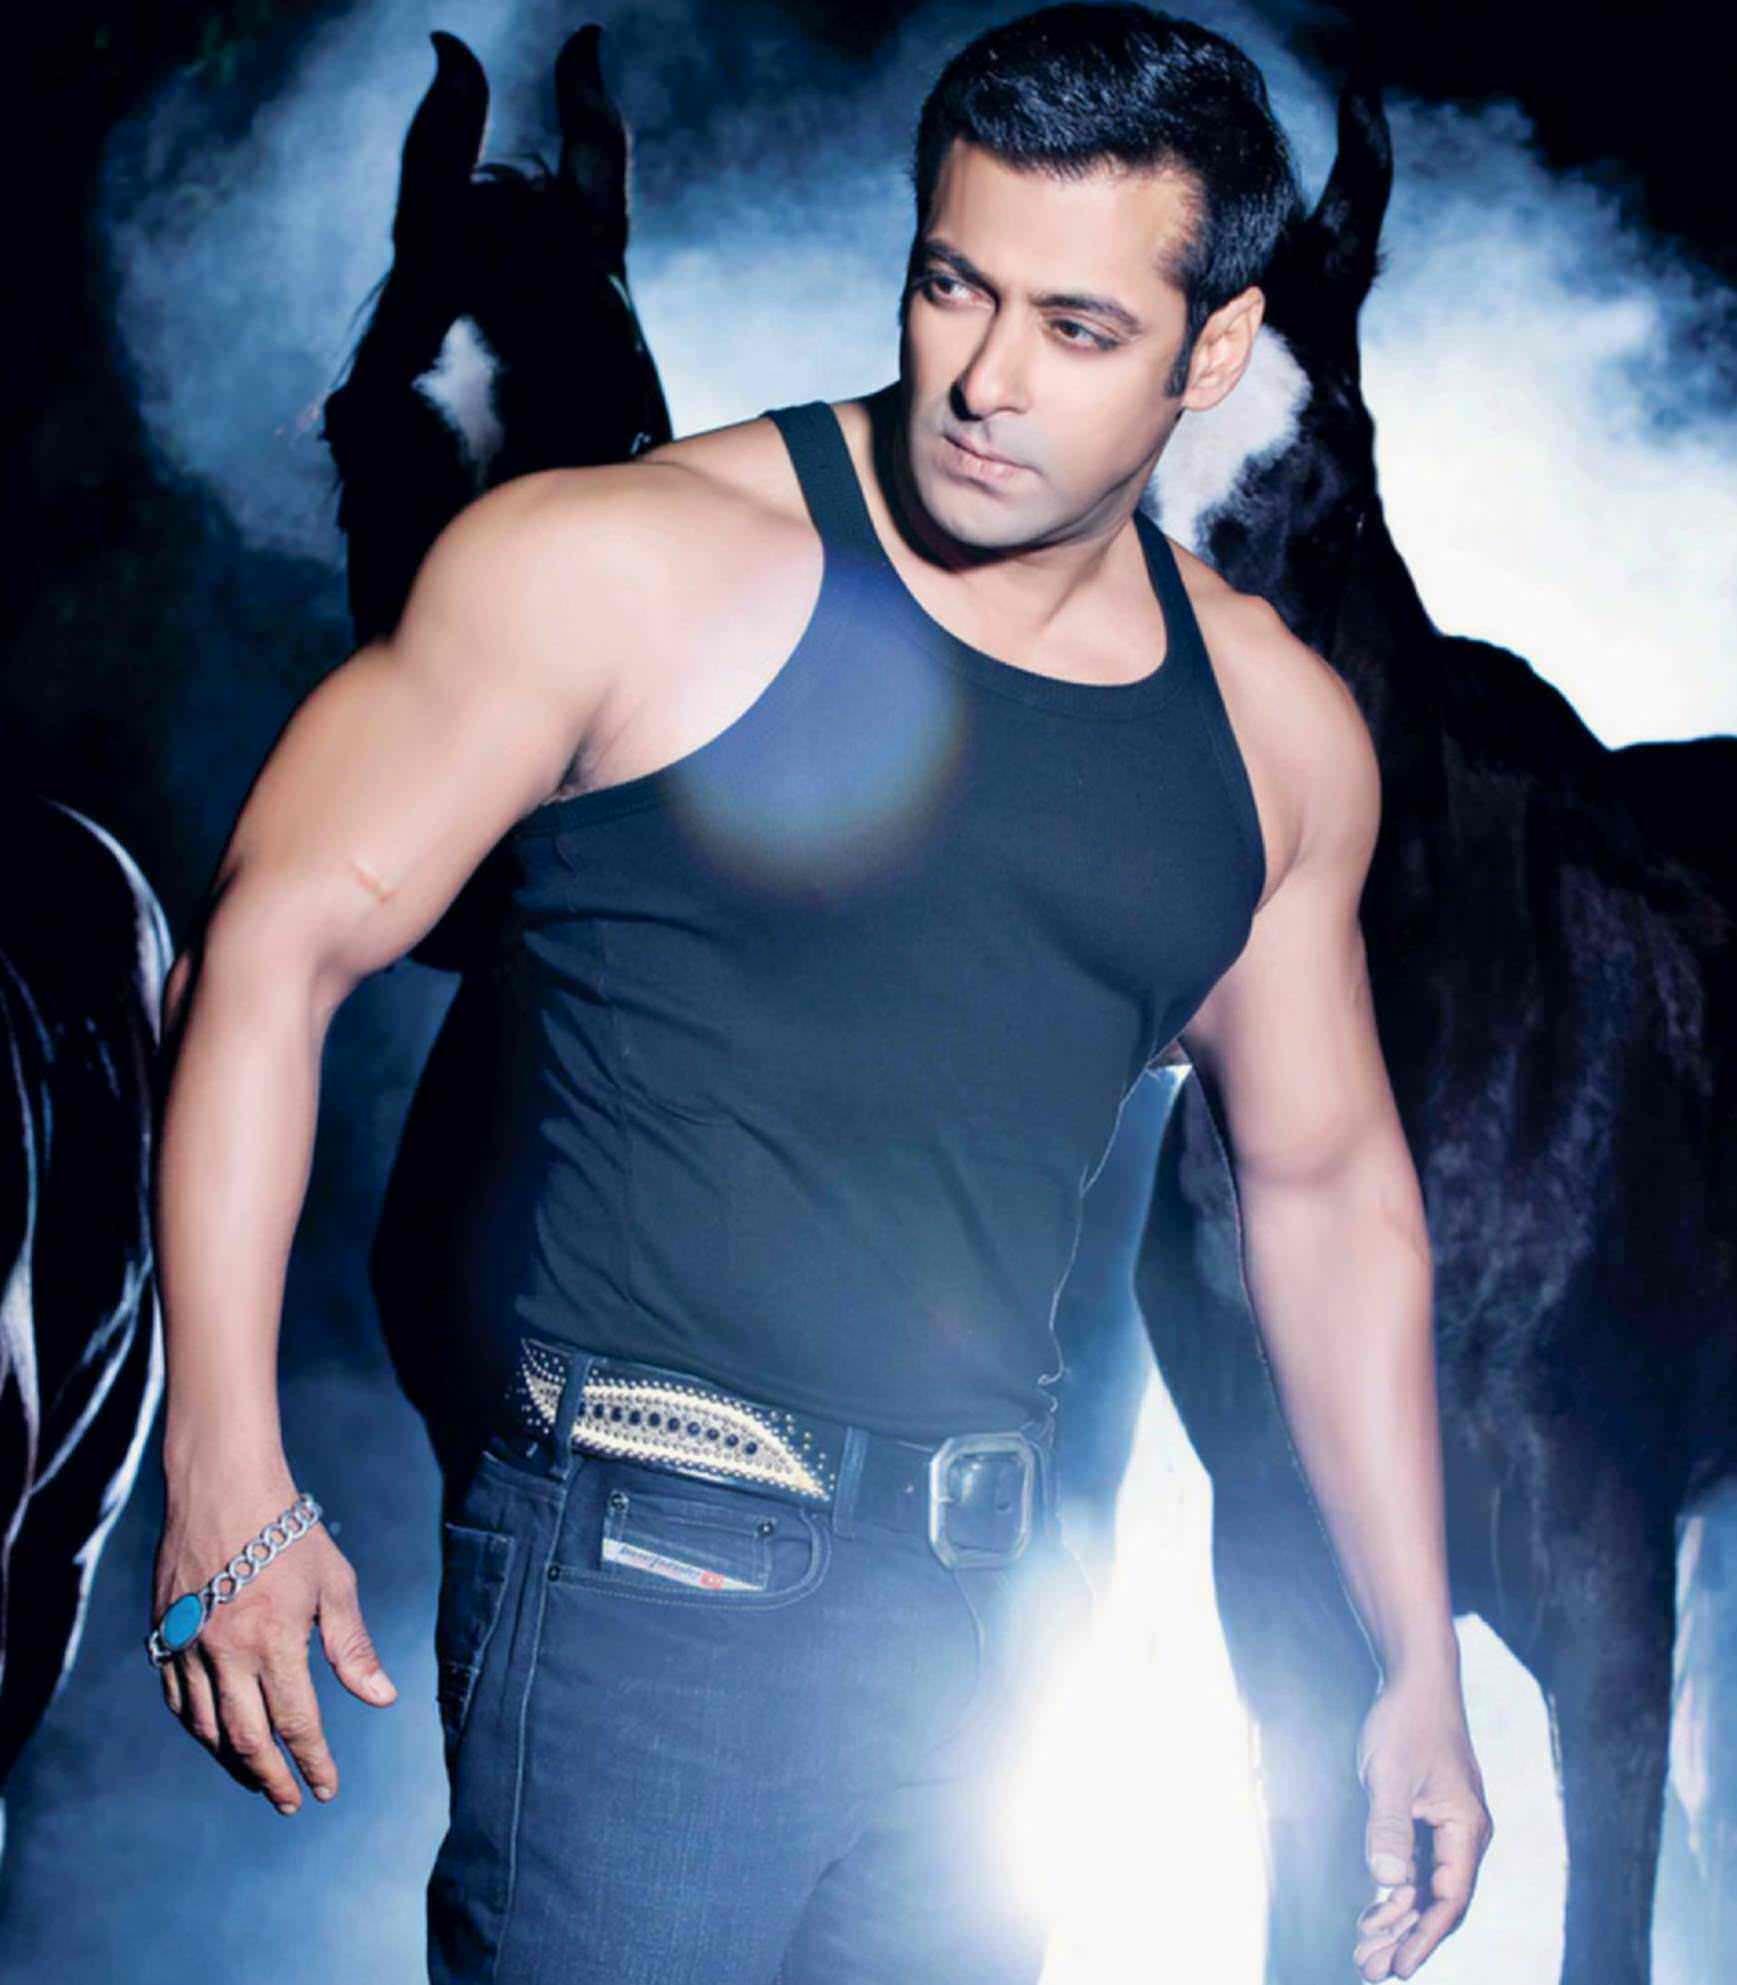 Did The (Black) Buck Get Passed To Salman Khan?